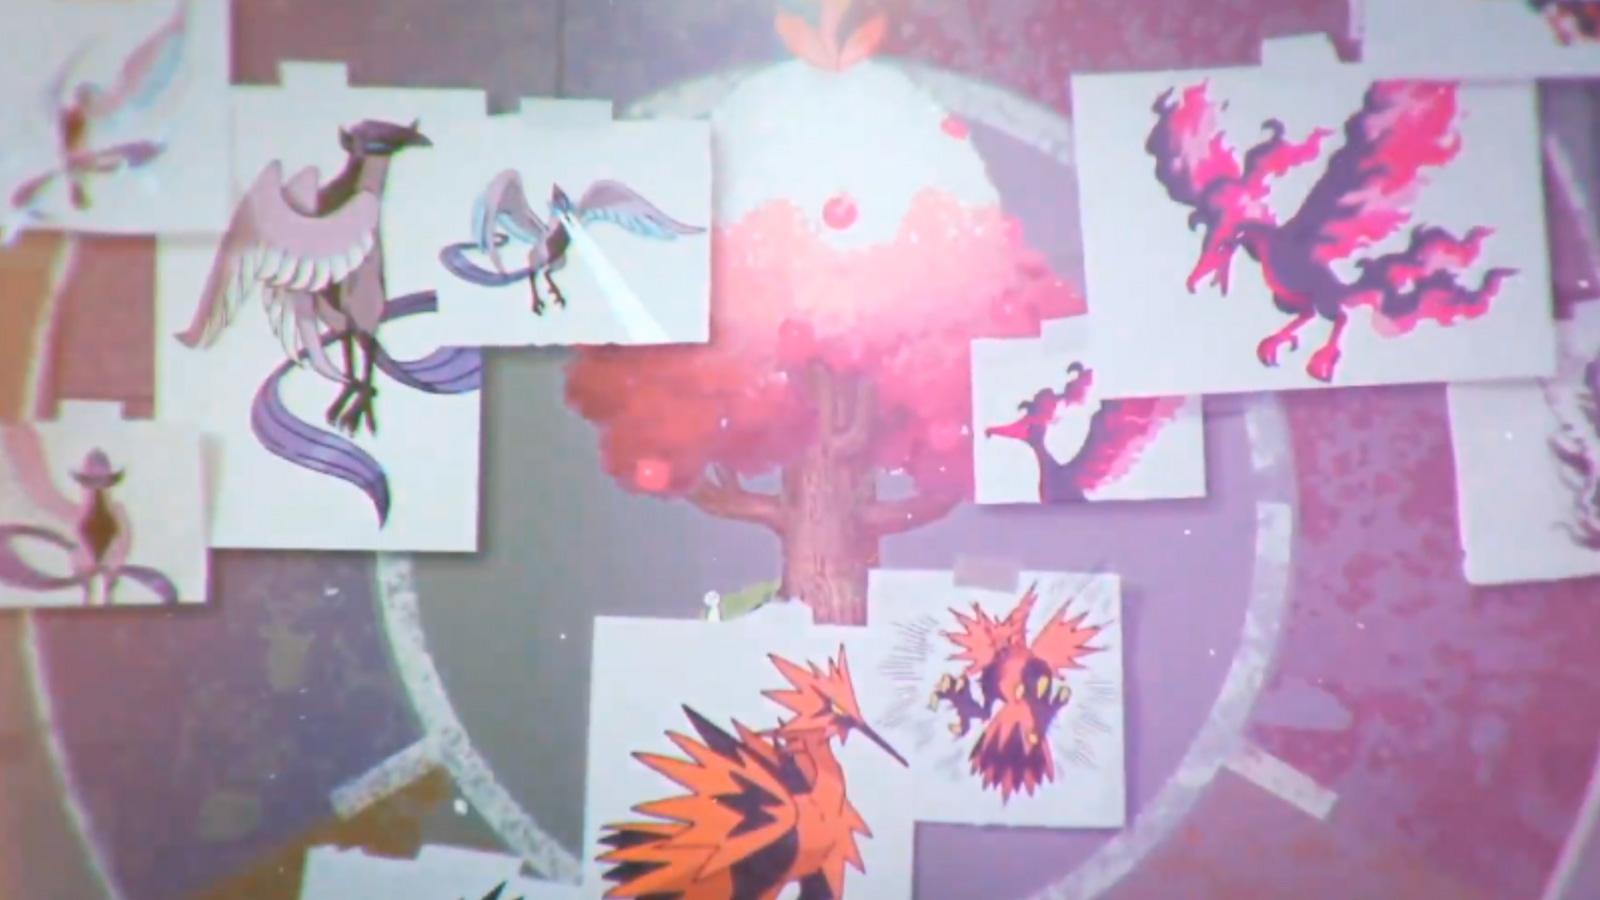 Pájaros legendarios Pokémon Las Nieves de la Corona